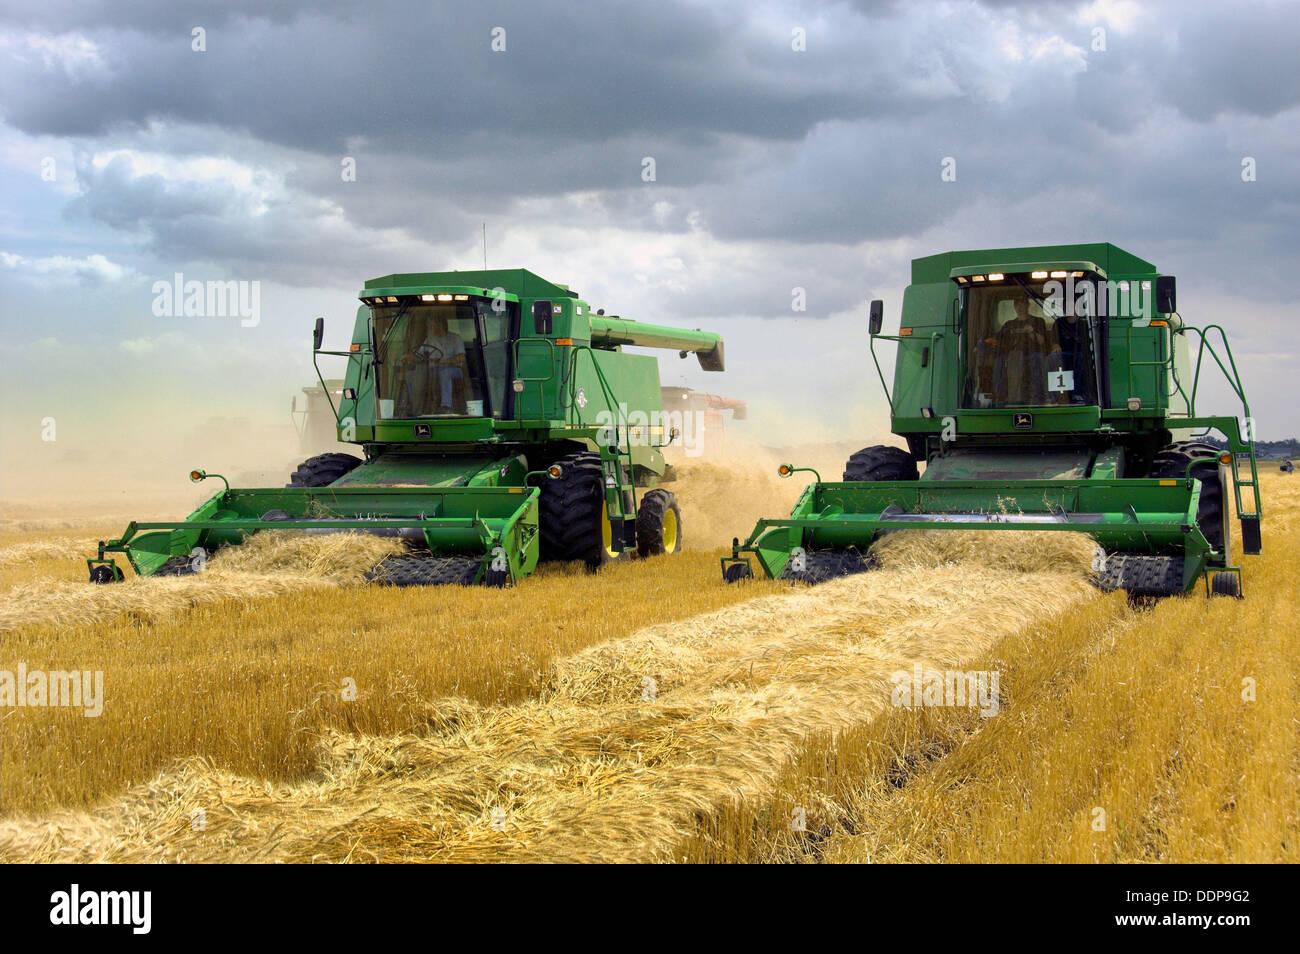 John Deere Combines Harvesting Wheat On A Field Near Winkler In Southern Manitoba Canada